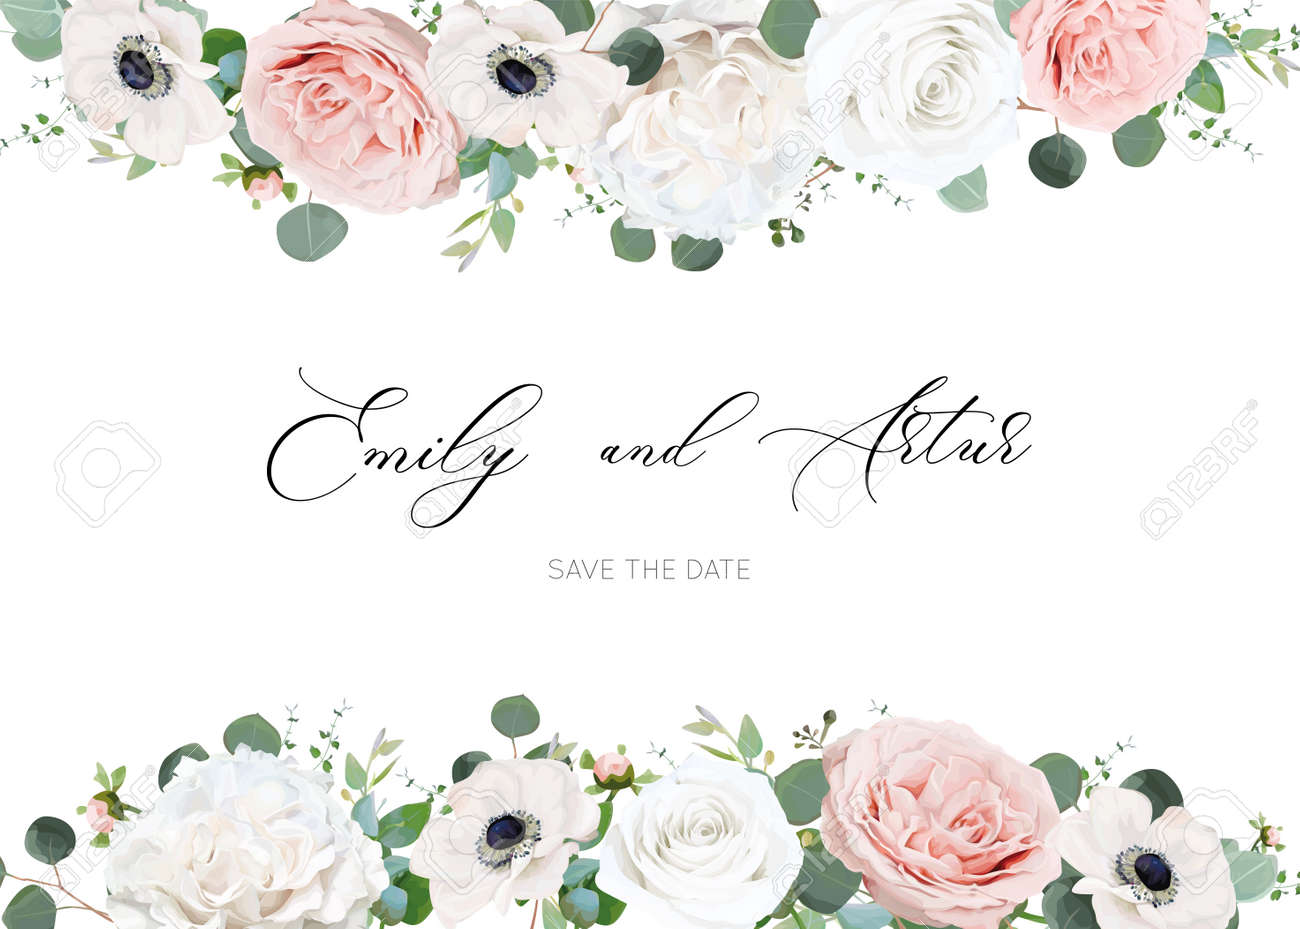 White ivory and blush peach stylish wedding invite design template - 156625025